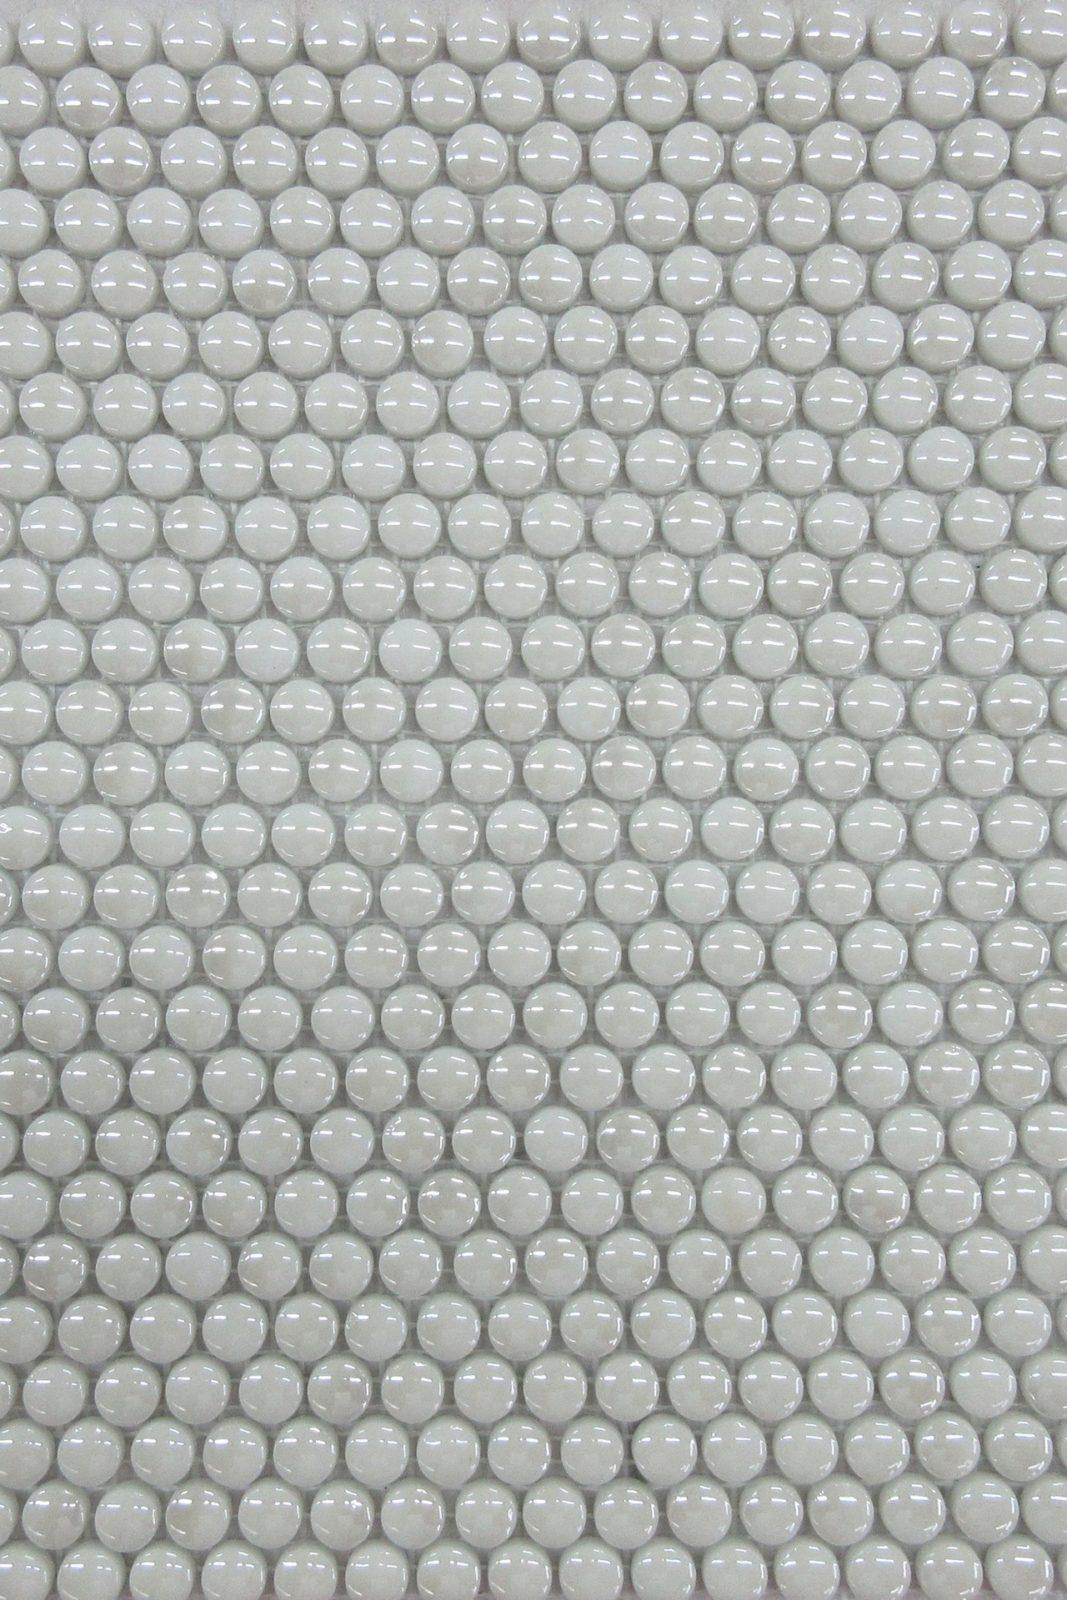 Mosaico - Contemporánea 06